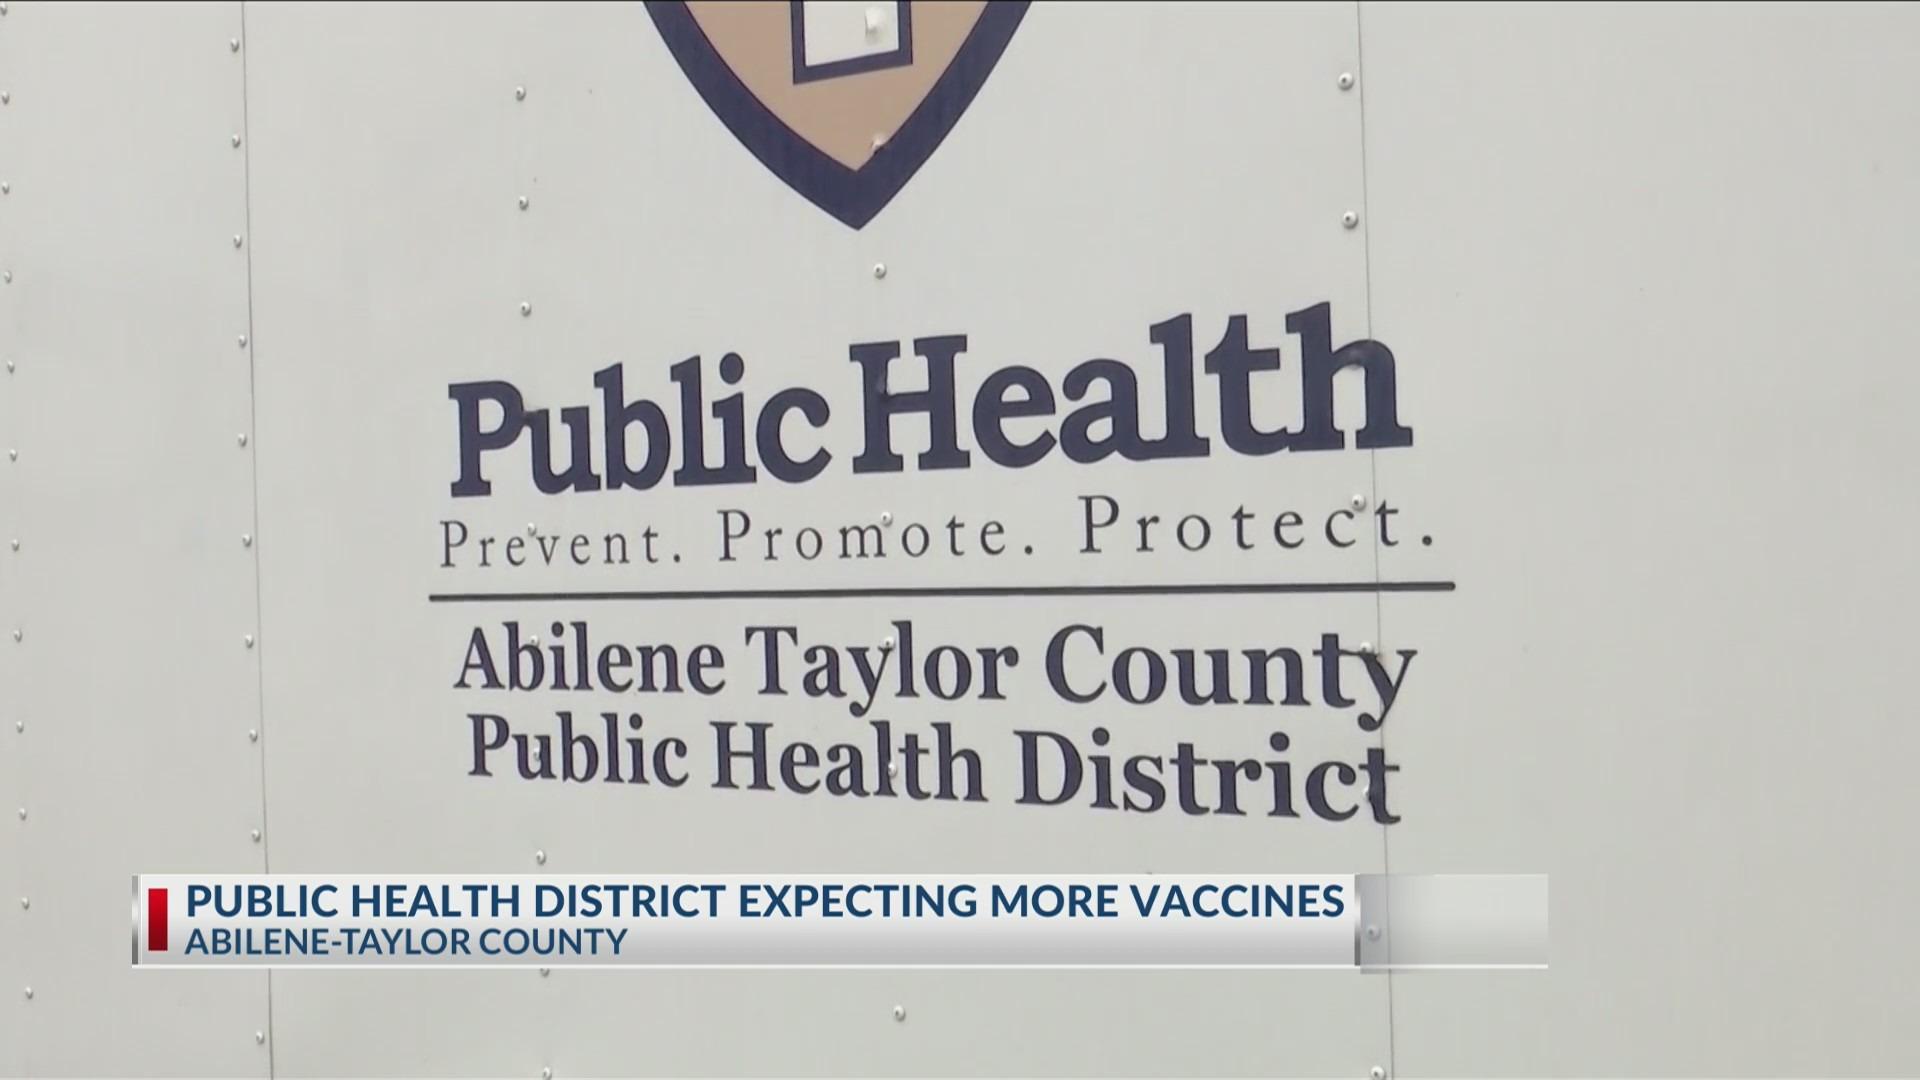 COVID-19 vaccine abilene taylor county